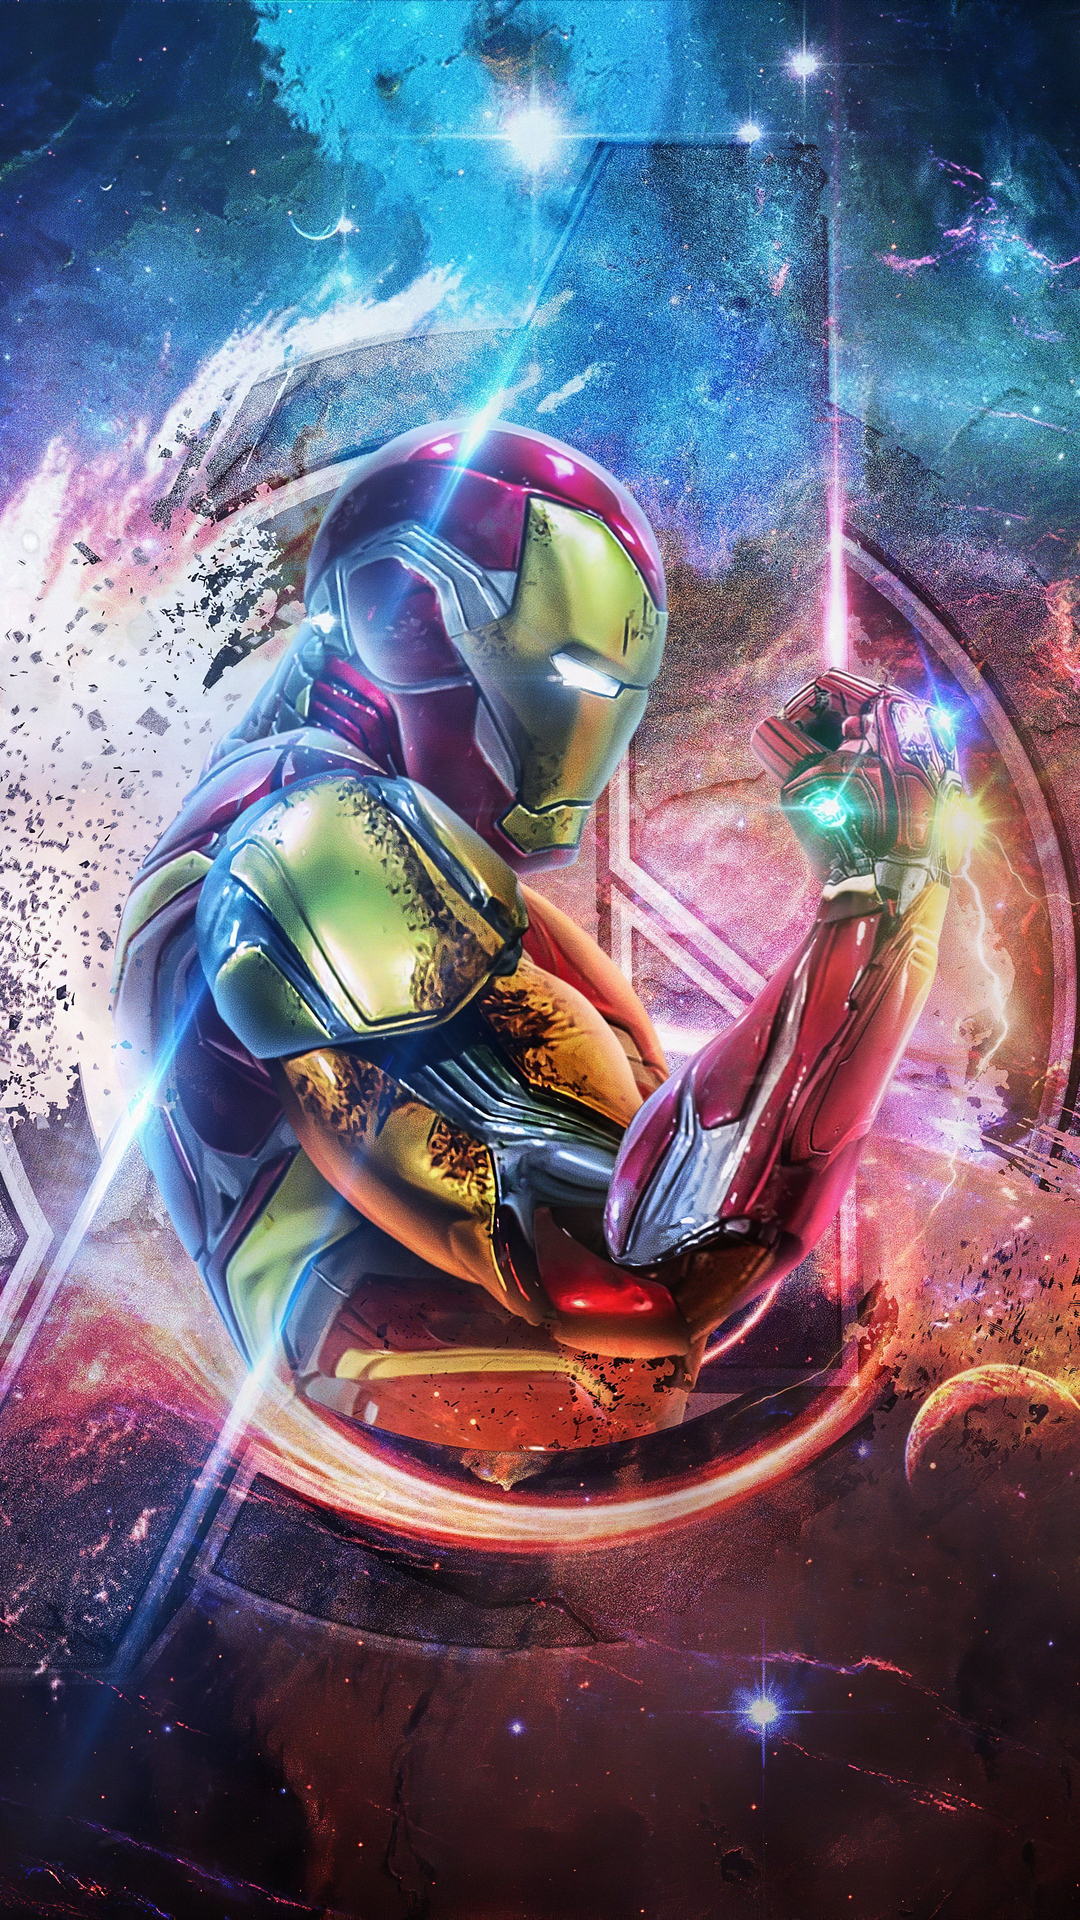 1080x1920 Iron Man 4k Avengers Endgame Iphone 76s6 Plus